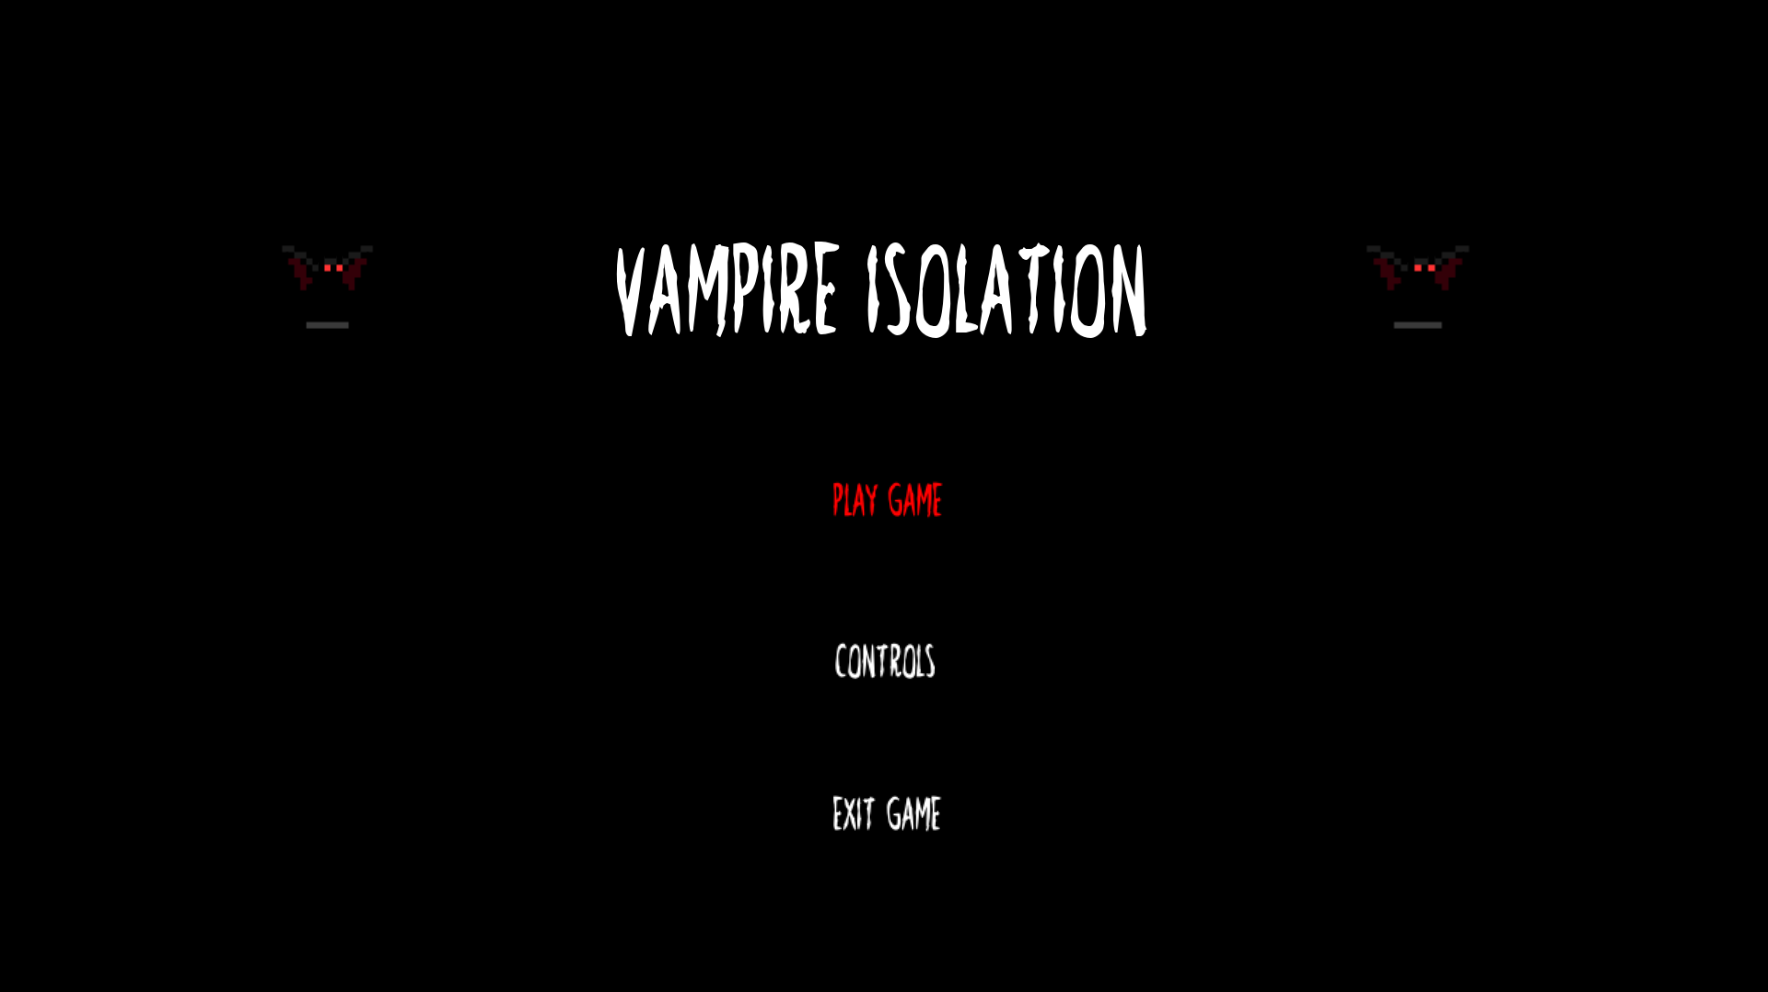 Vampire Isolation